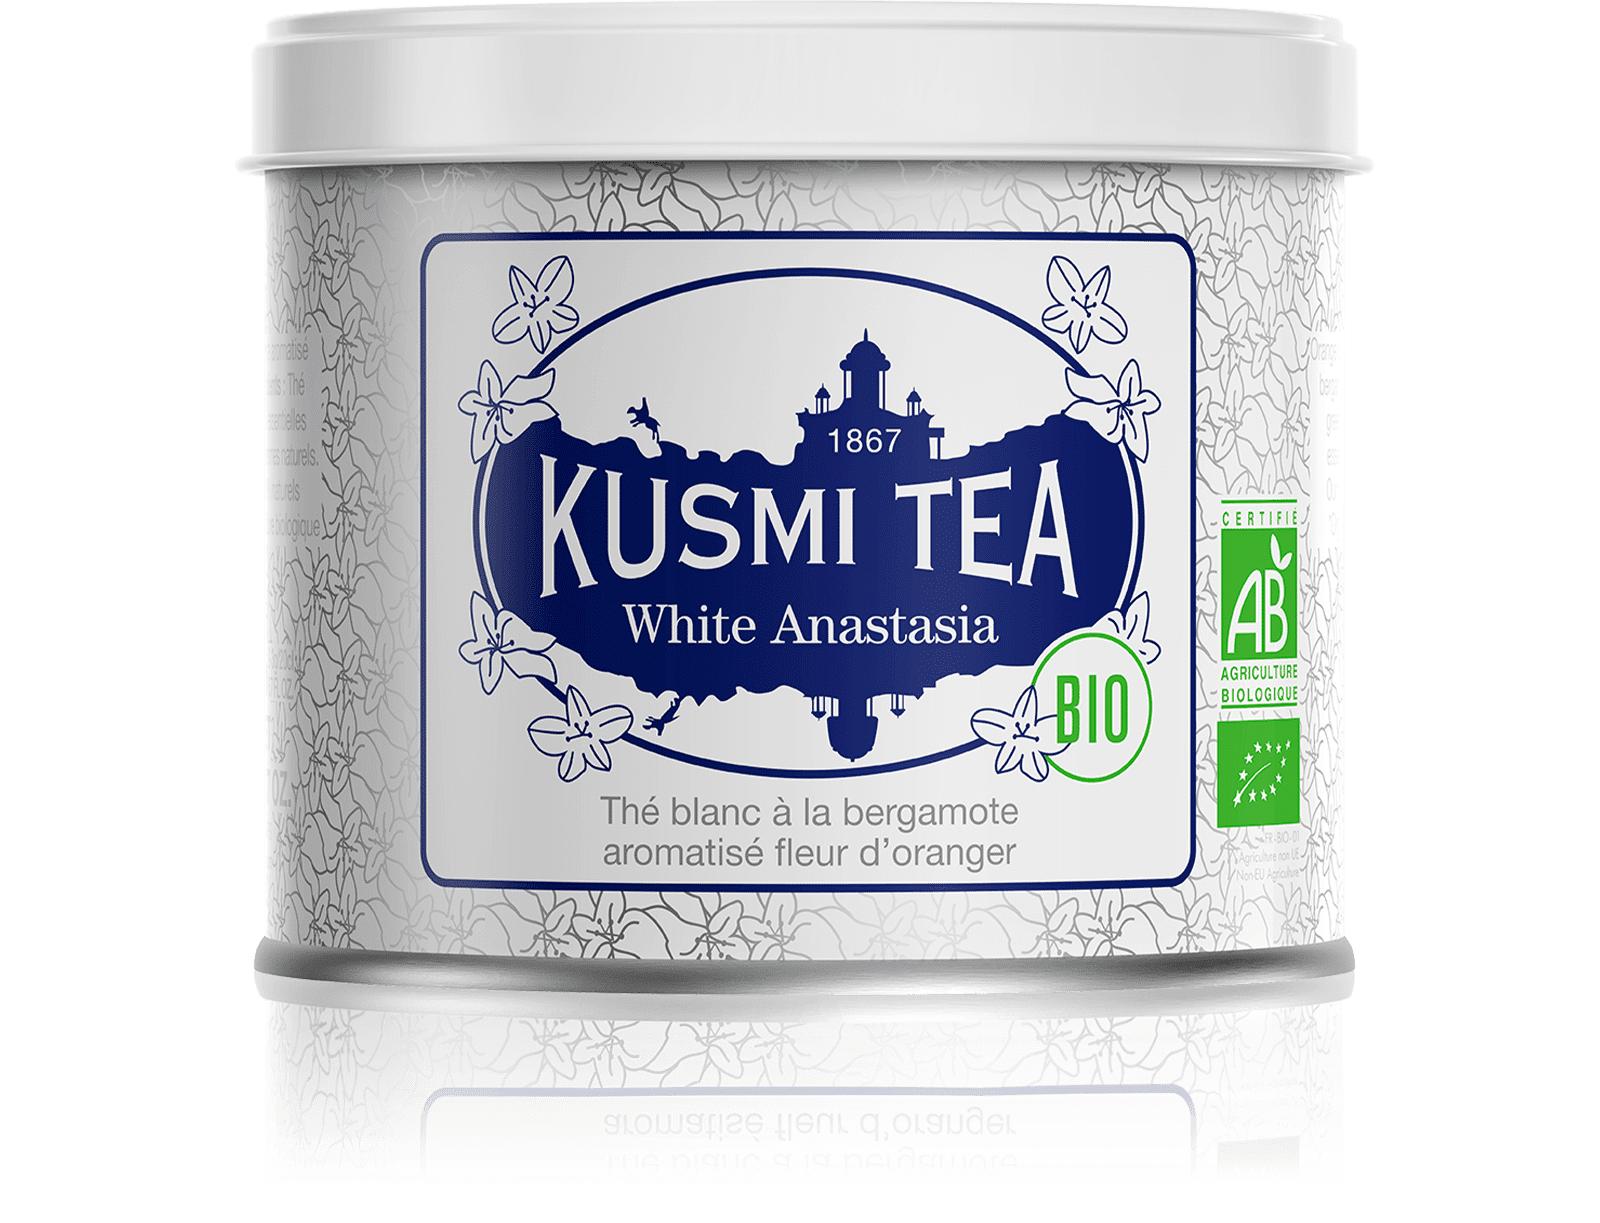 KUSMI TEA White Anastasia bio - Thé blanc, bergamote - Kusmi Tea